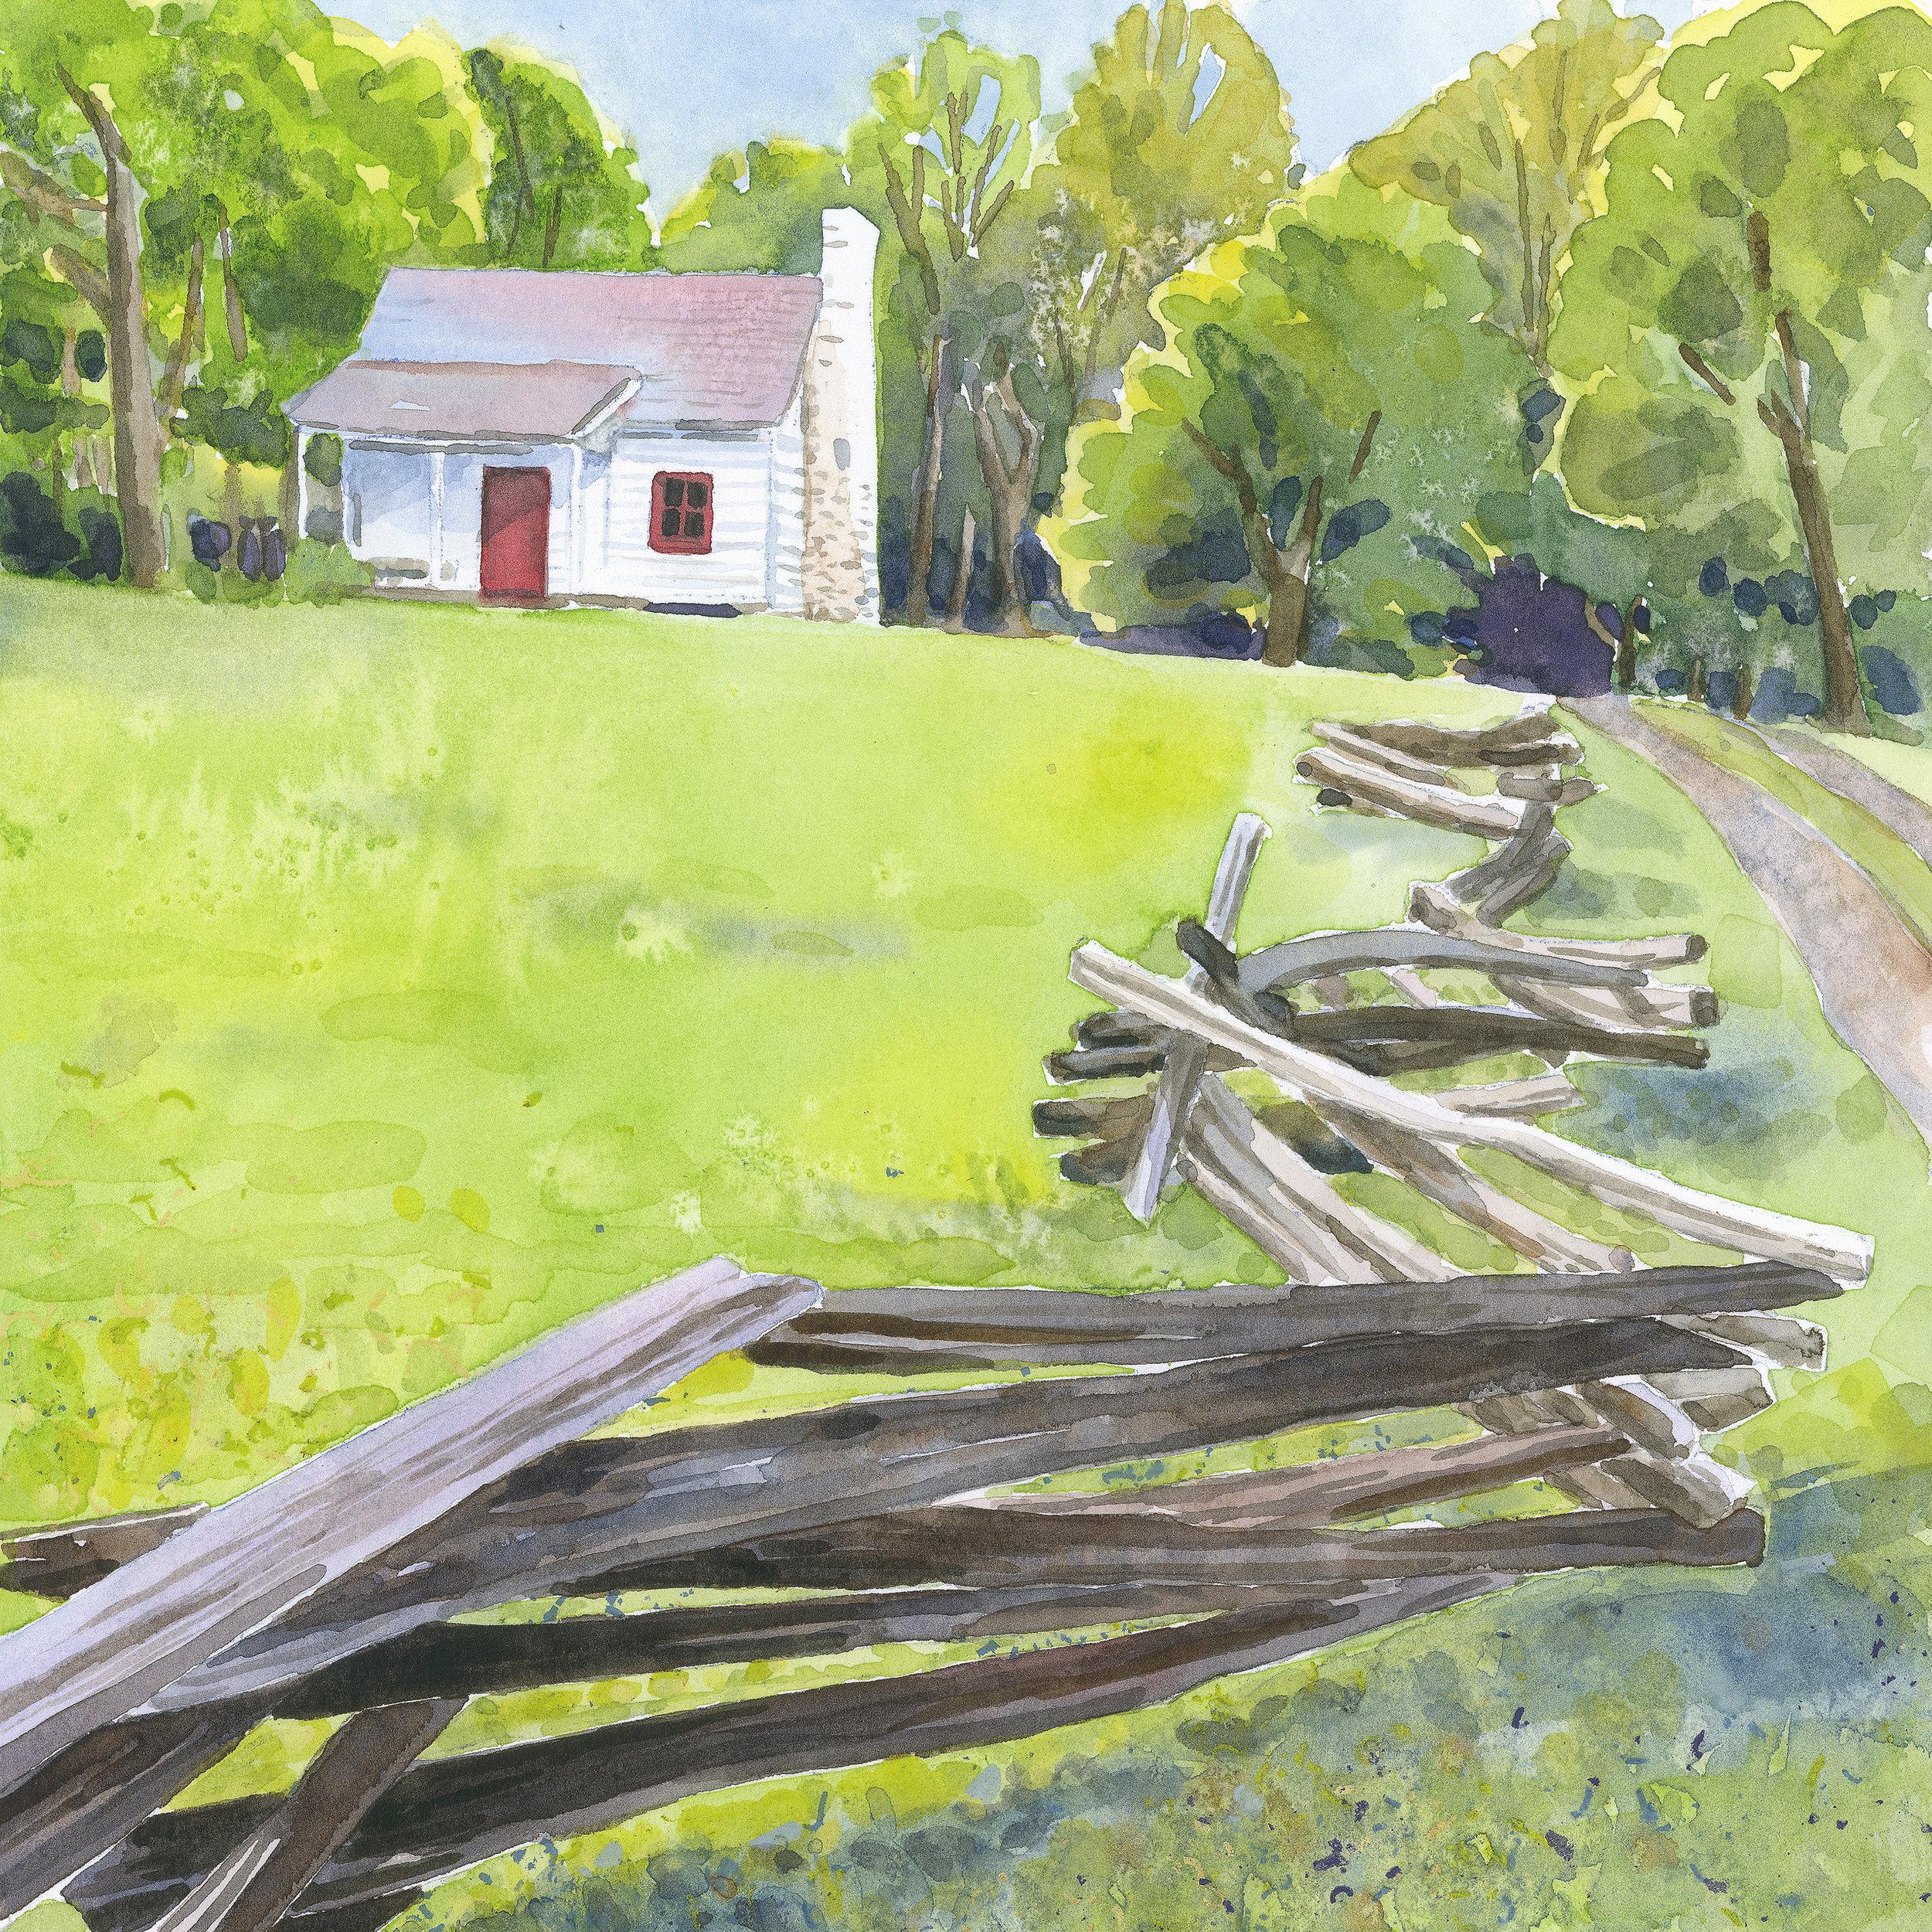 Gordonsville Cabin  archival print   8.5 x 8.5 image   $50